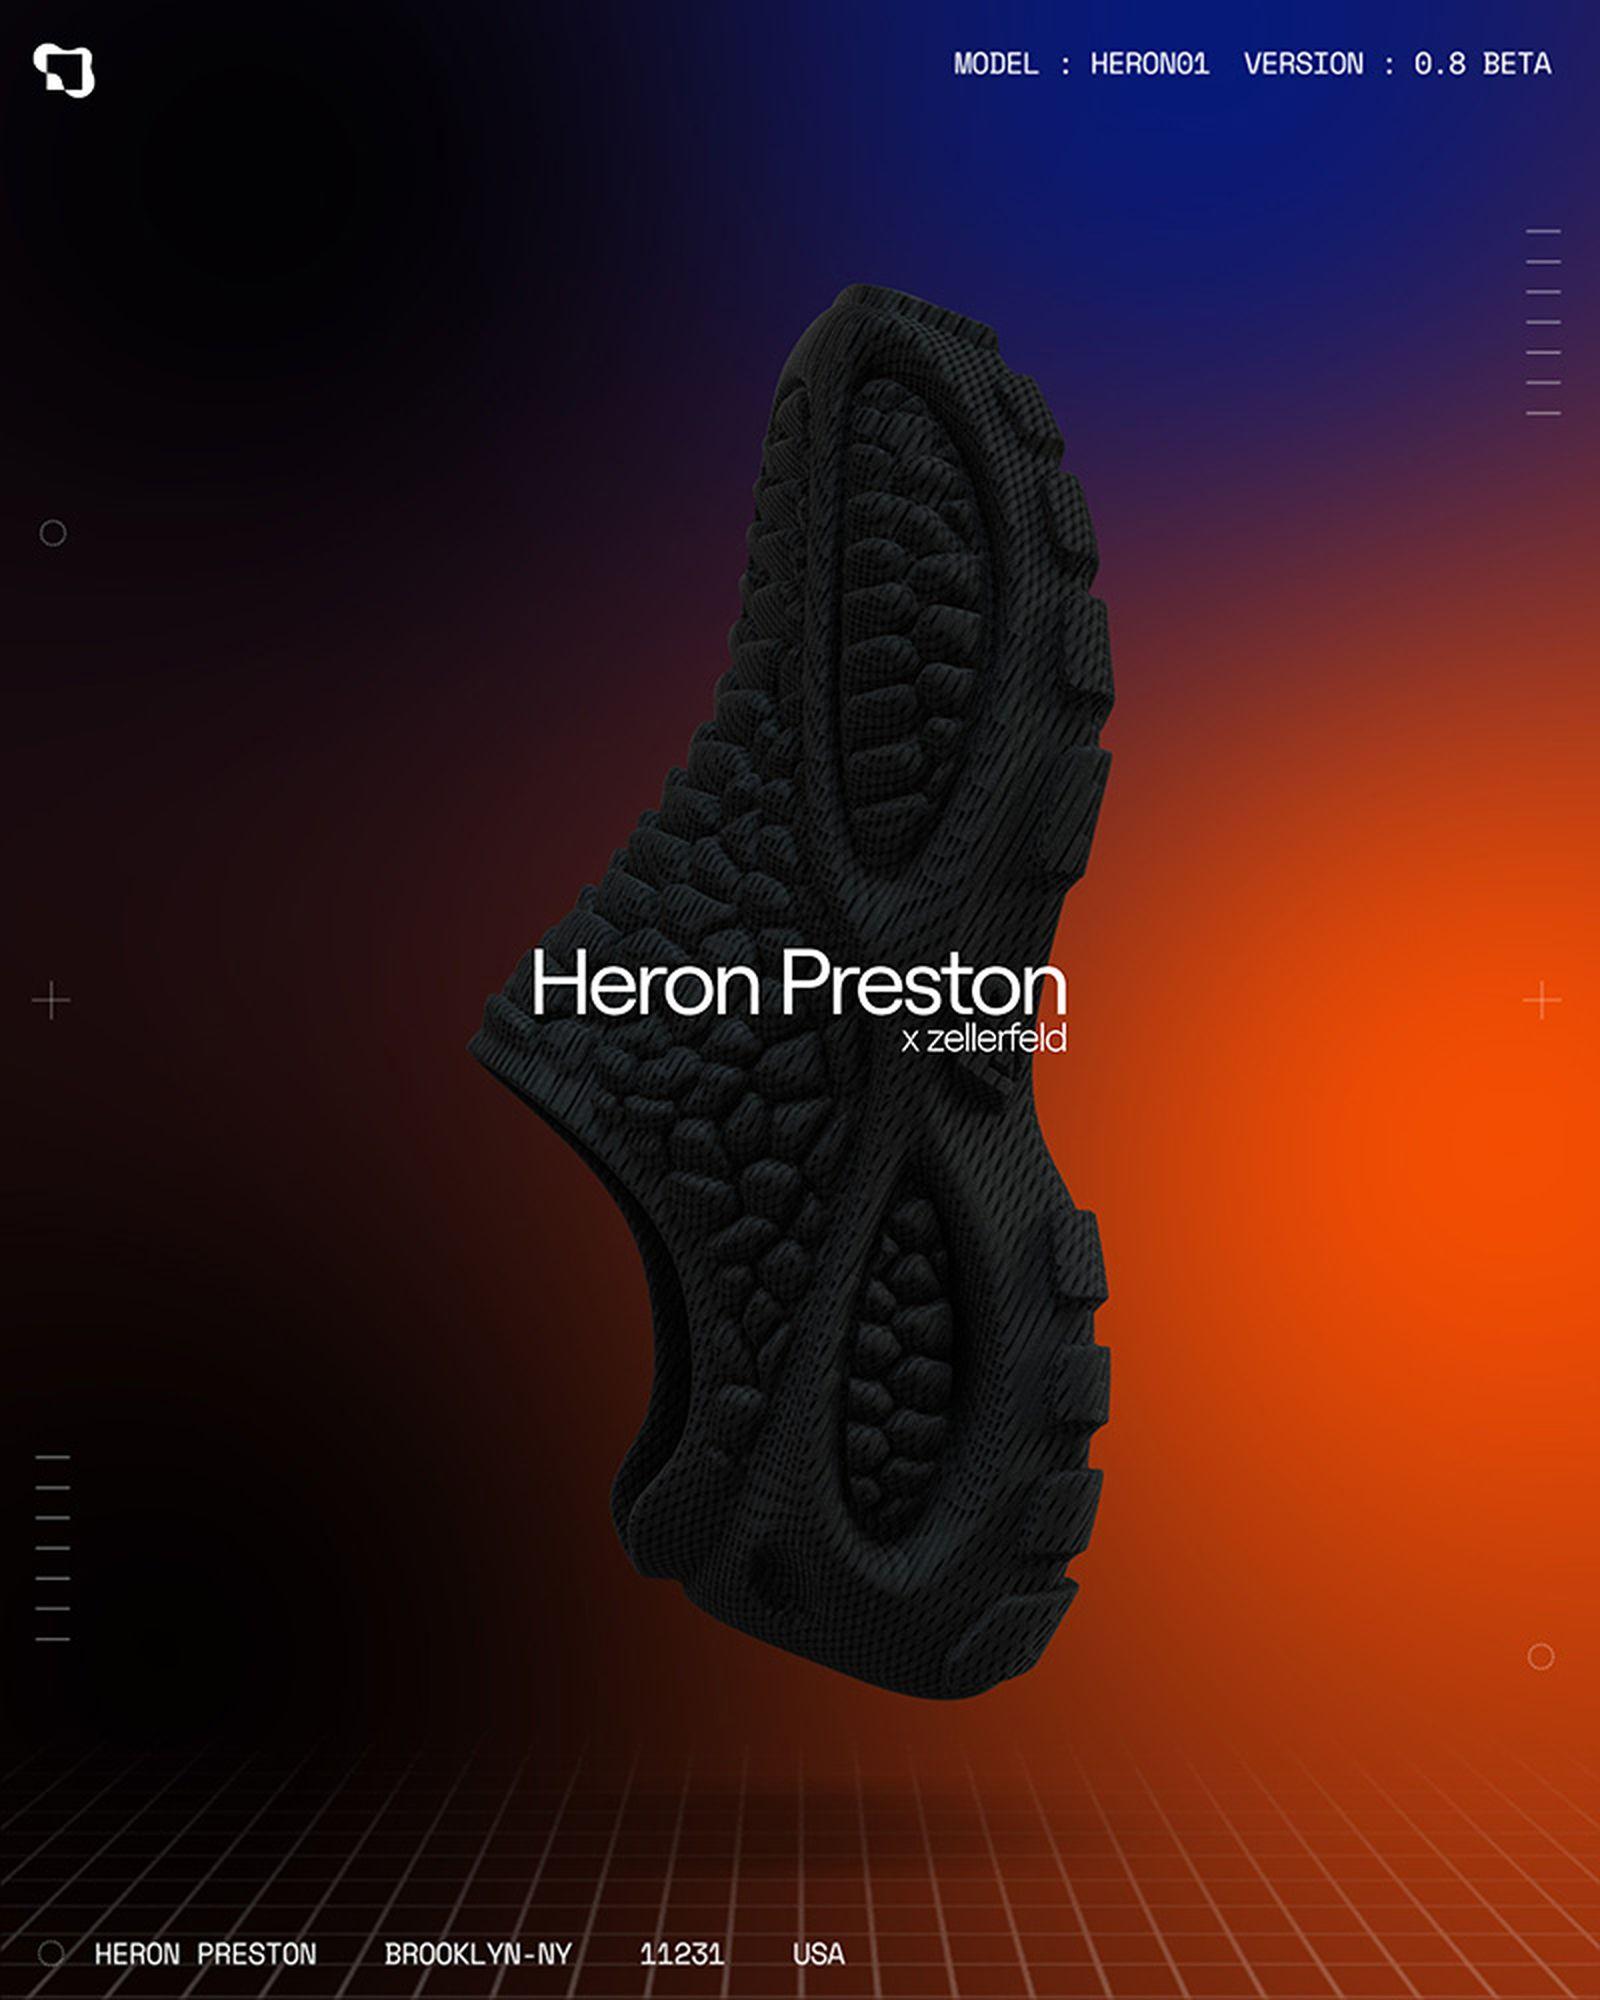 heron-preston-zellerfeld-heron01-release-date-price-04